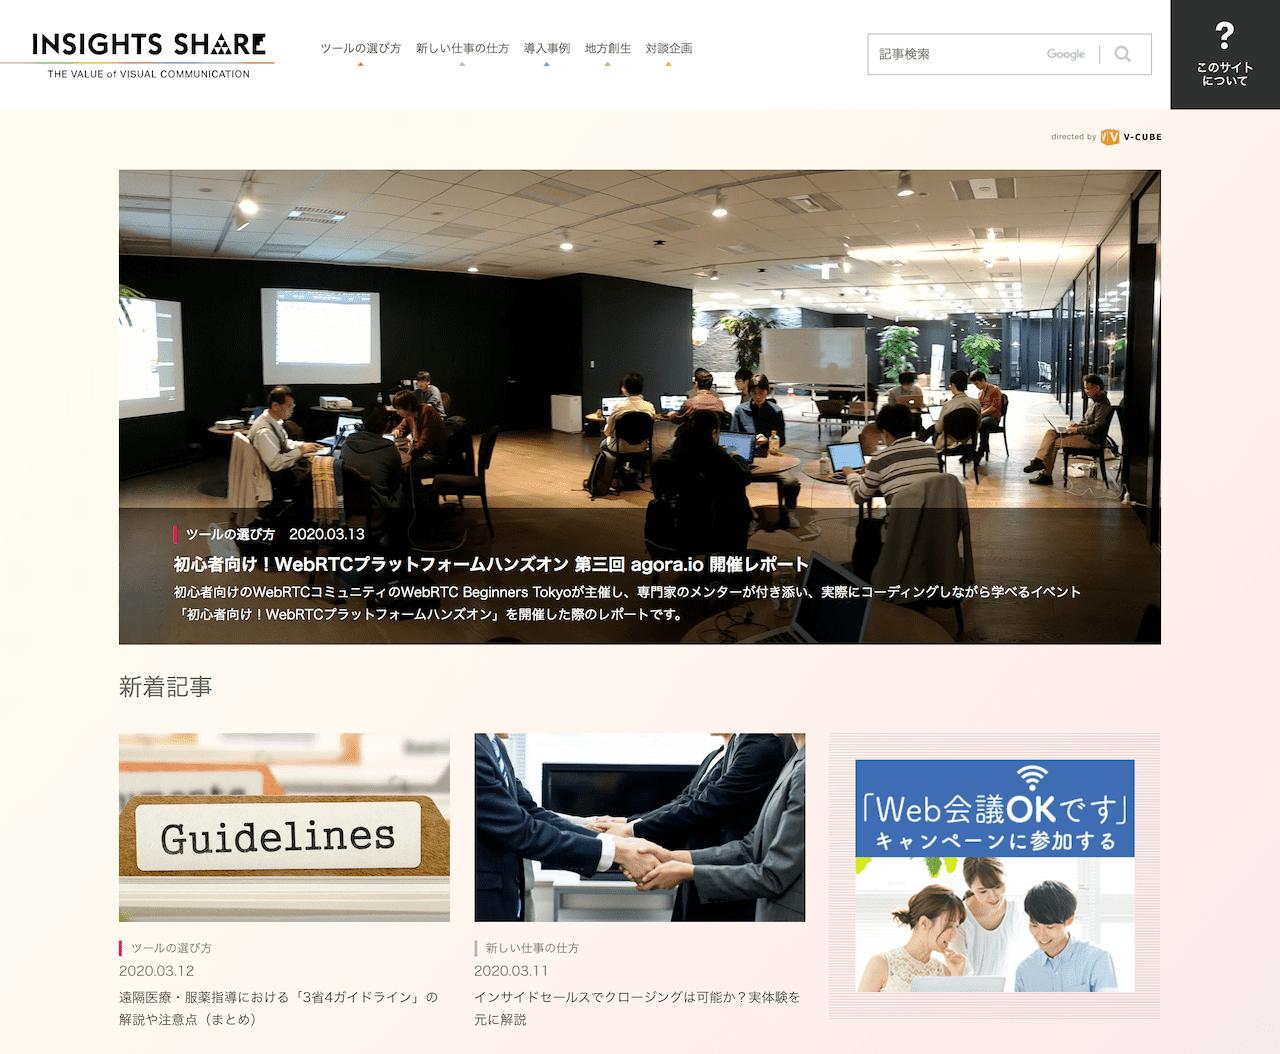 INSIGHT SHARE - HubSpot ブログ機能で構築